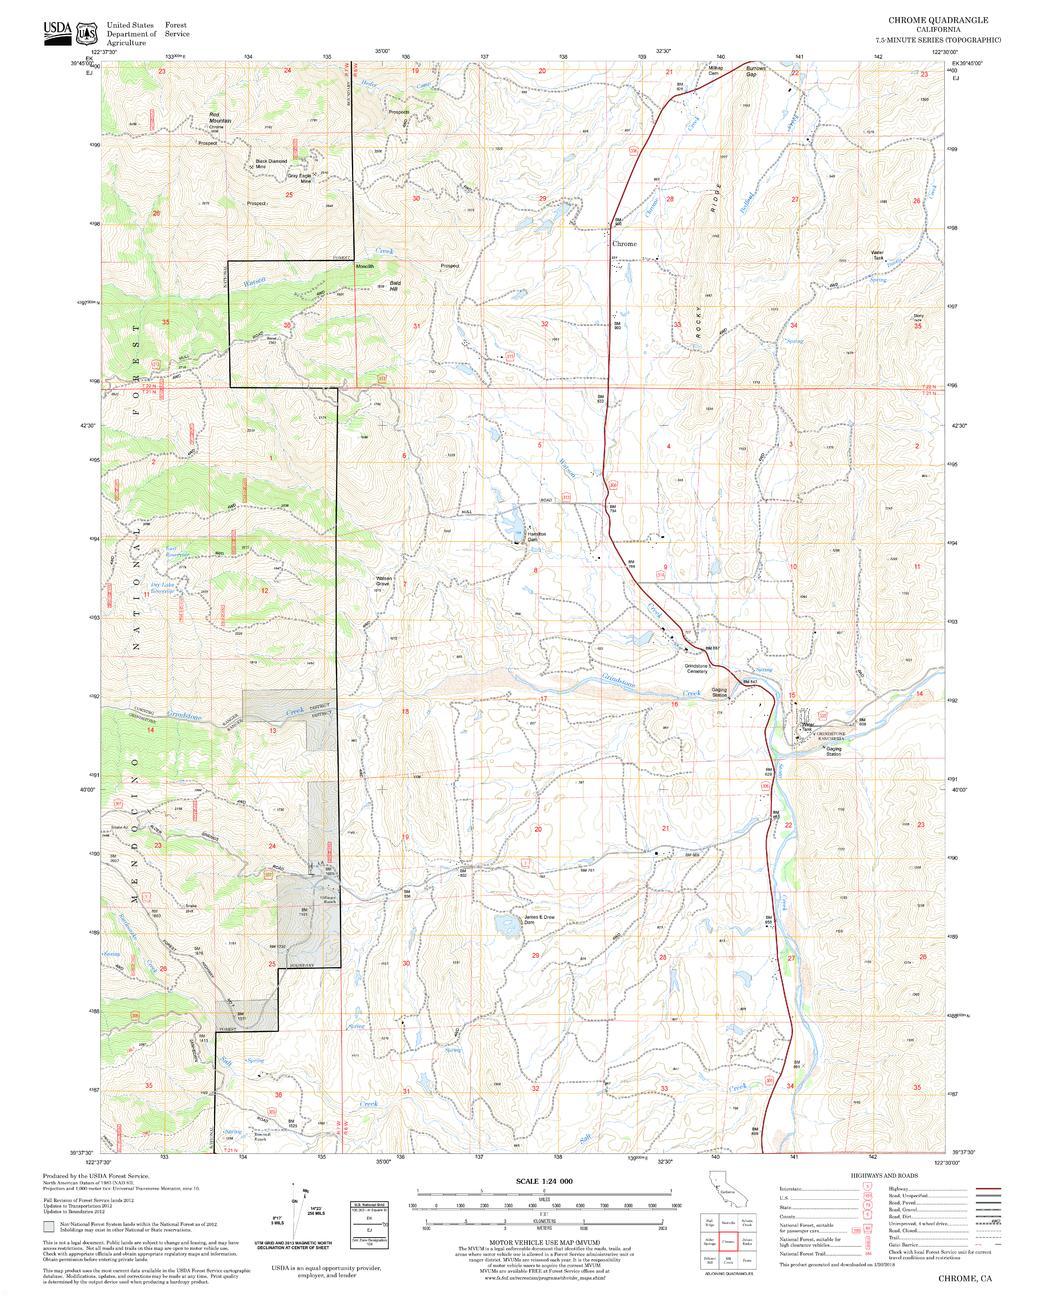 Chrome Quadrangle Map, California on mapquest maps, chromium maps, skype maps, mercury maps, silicon maps, coffee maps, mozilla maps, rust maps, microsoft maps, acrylic maps, explorer maps, venus maps, apple maps, iphone 6 maps, internet maps, burgundy maps, black maps, google maps, mobile maps,